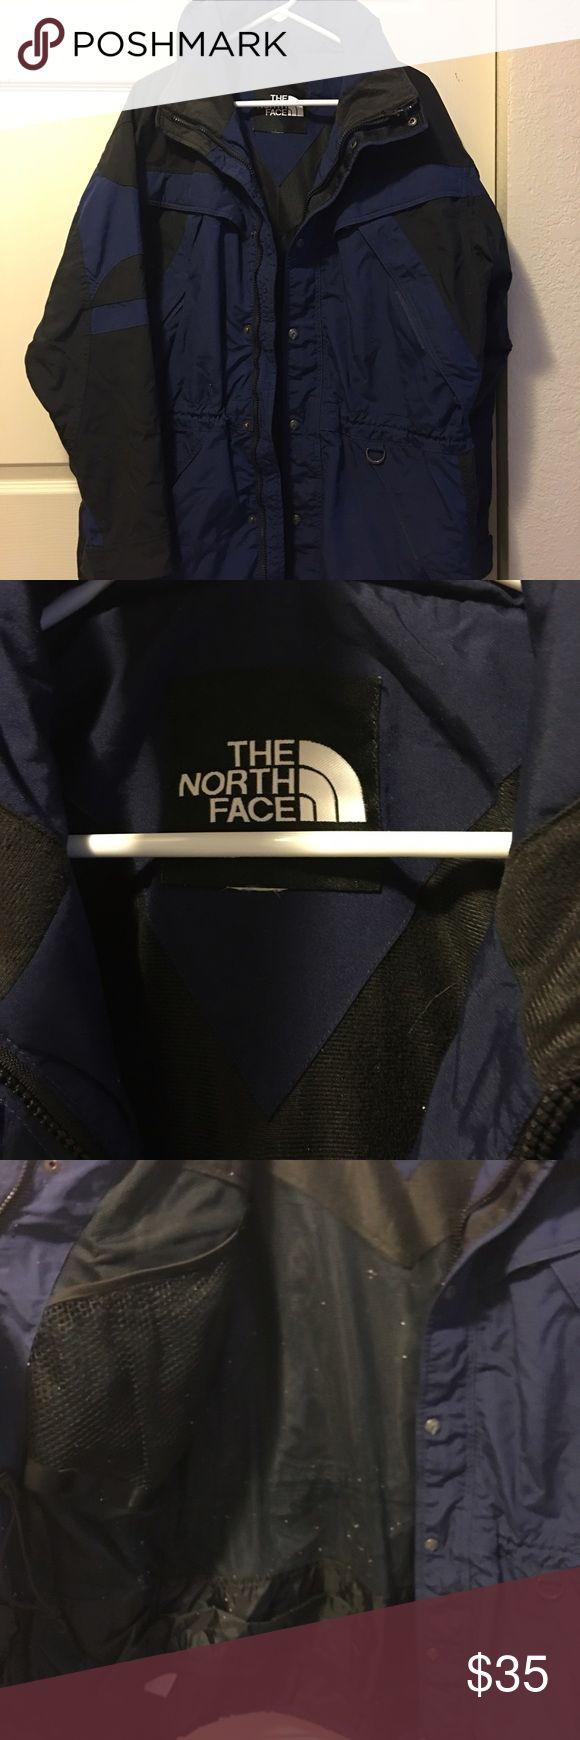 THE NORTH FACE WINTER JACKET SZ XL Tag was remove due to itchyness sz xl The North Face Jackets & Coats Windbreakers